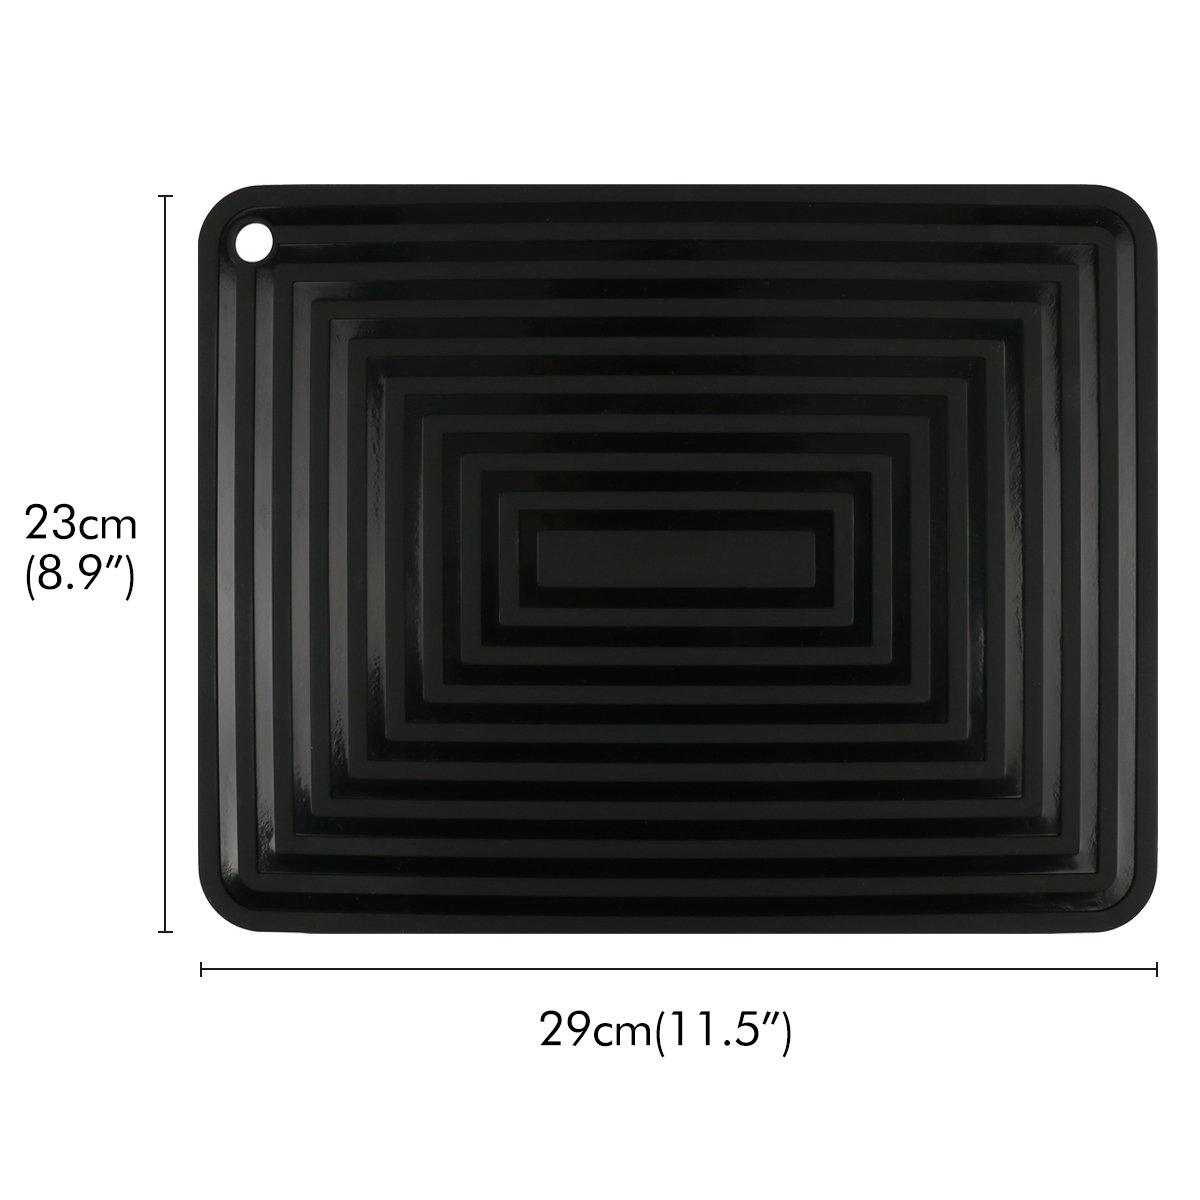 2 Pack,Silicone Trivet Mats/Hot Pads,Pot Holder,9''x12'' Non Slip Flexible Durable Heat Resistant Pot Coaster Kitchen Table Mats (Black) by LogHog (Image #3)